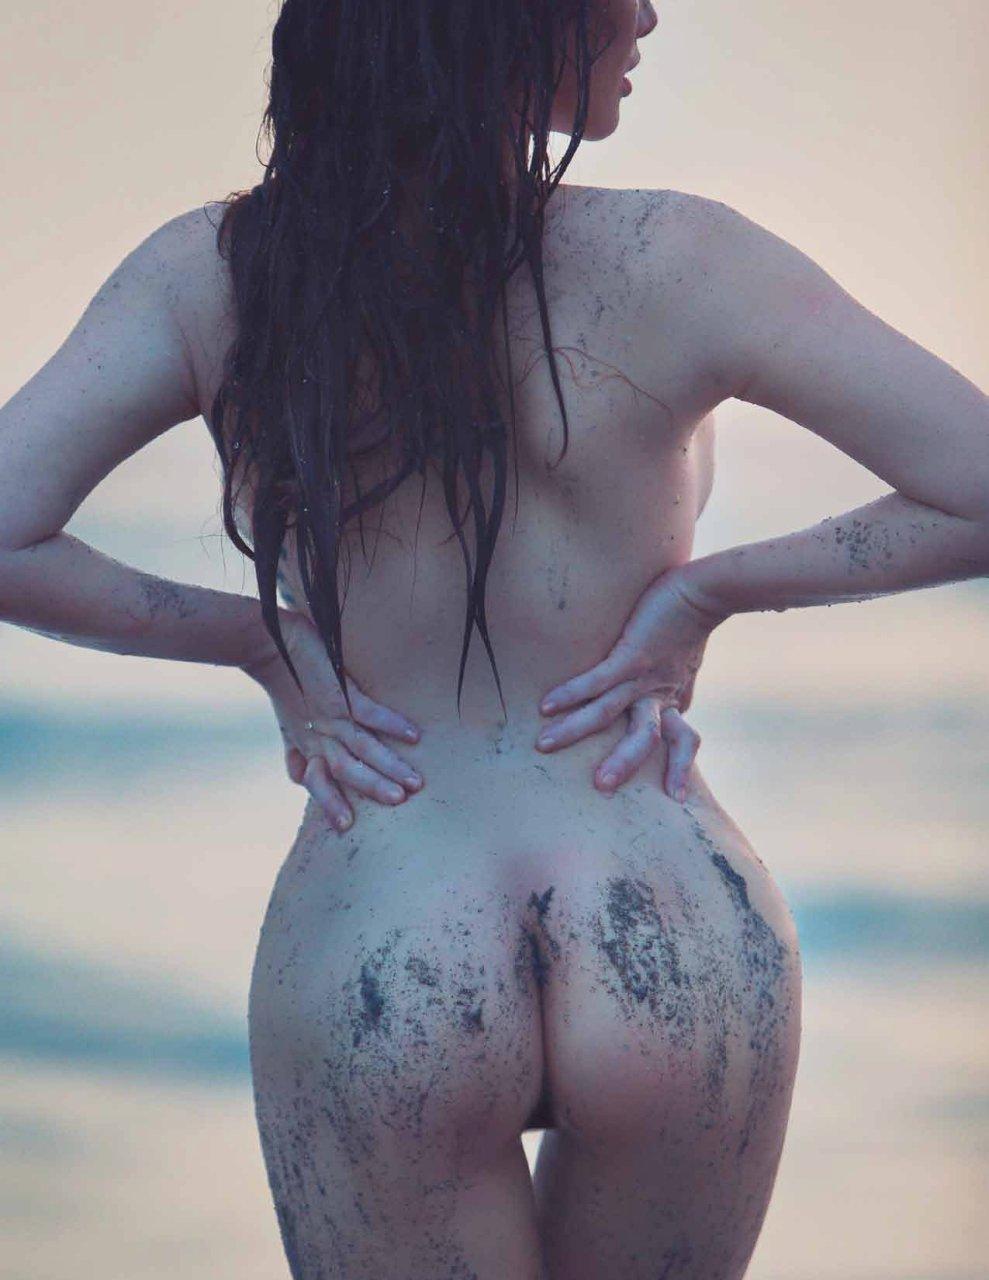 Forum on this topic: Nicole richie street style los angeles, ellen-adarna-nude-sexy-7-photos/